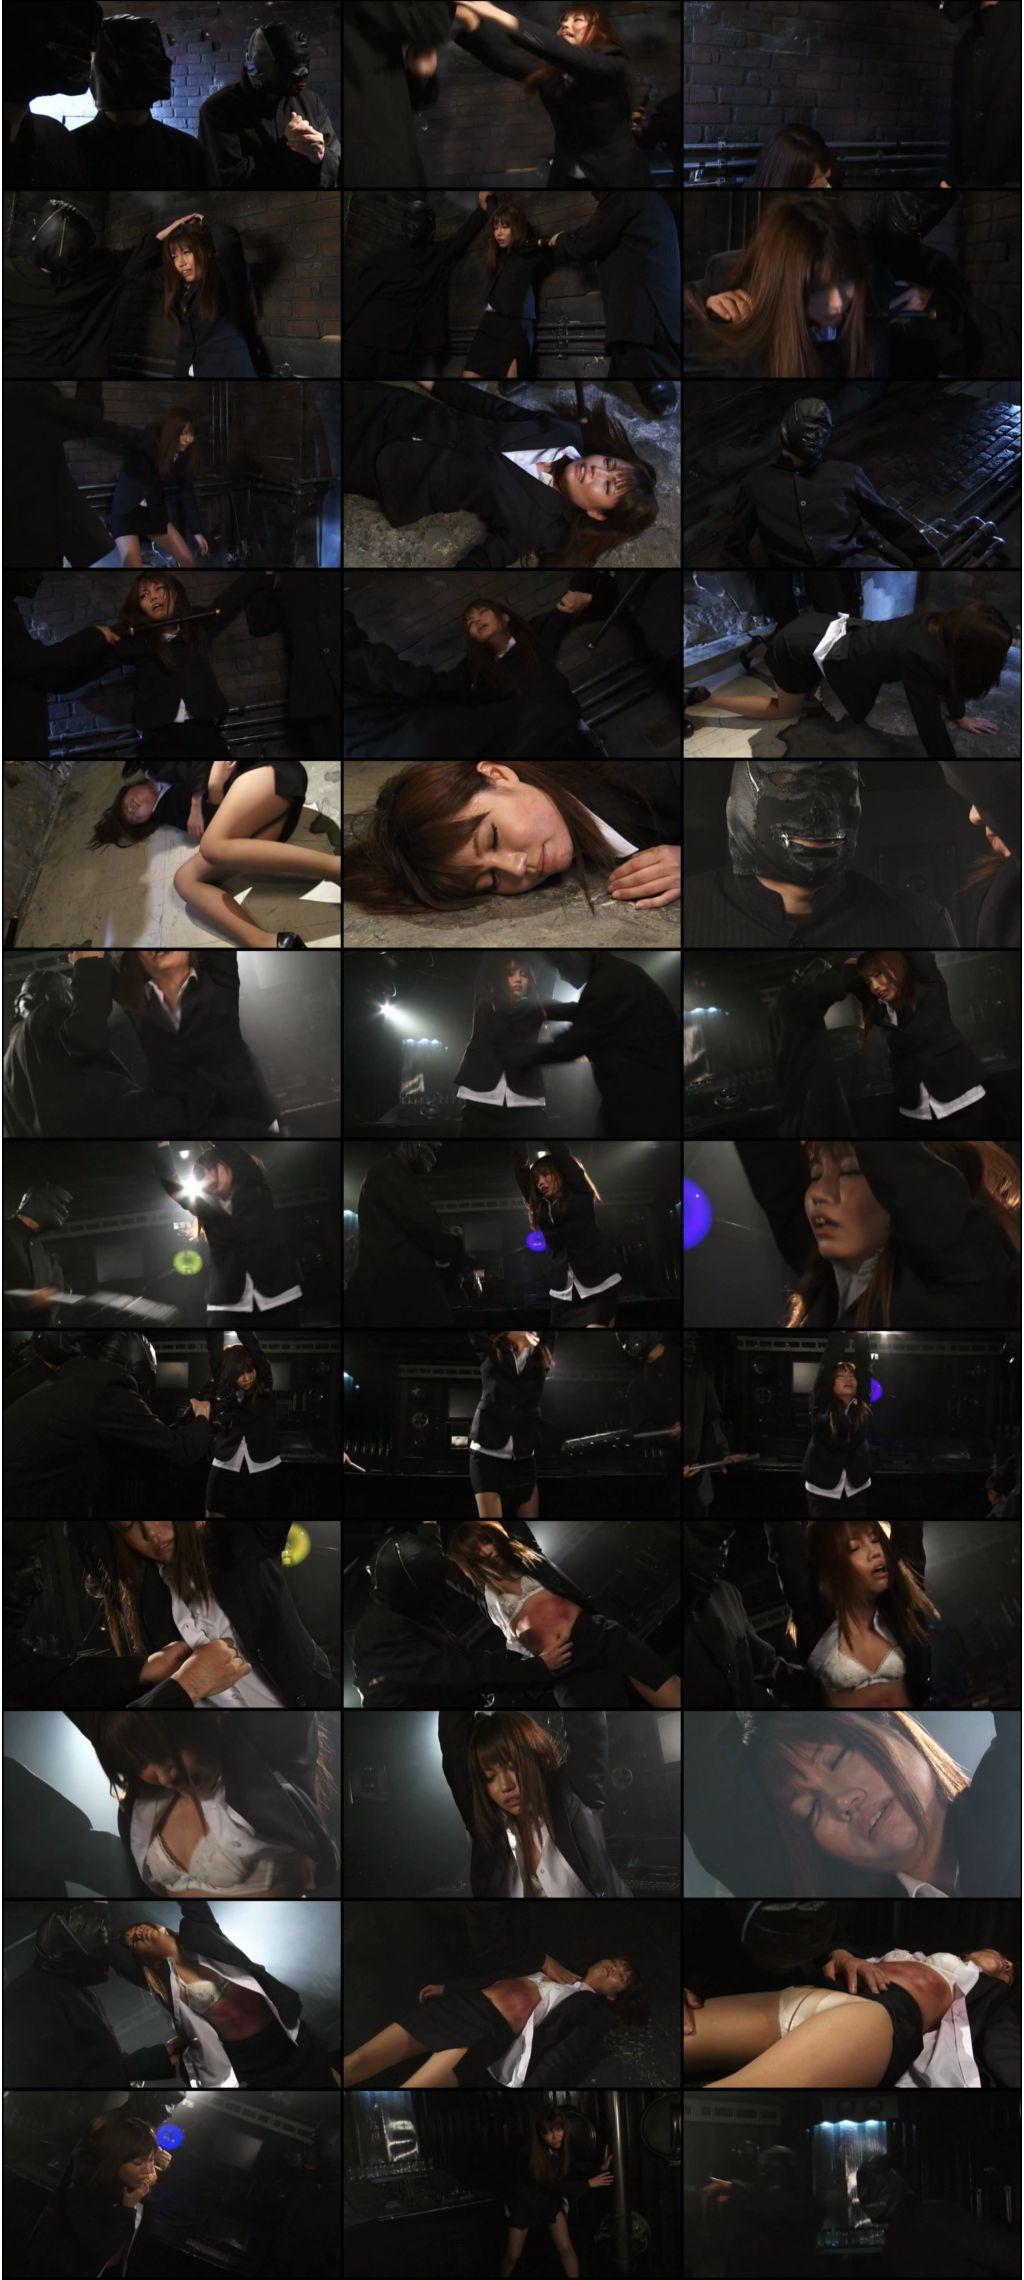 [GGTB-28] ヒロインボディーブロー ~女捜査官・雨平夏希~ コスチューム  Sentai / Anime / Game  Police / Investigator 大見はるか ギガターボ